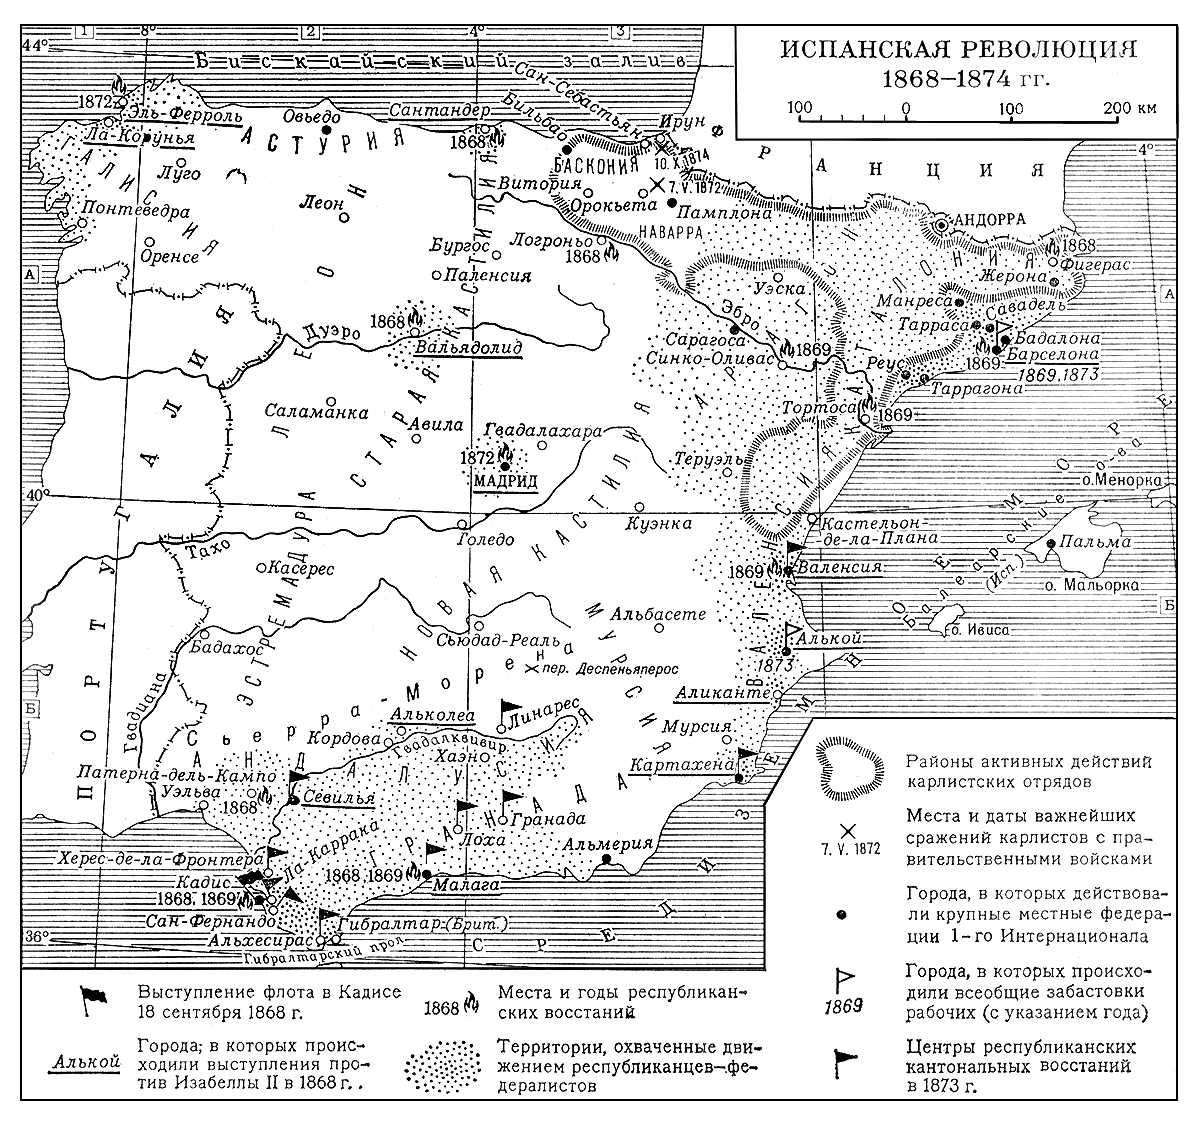 Испанская революция 1868—1874 гг. Испанские революции 19 века.